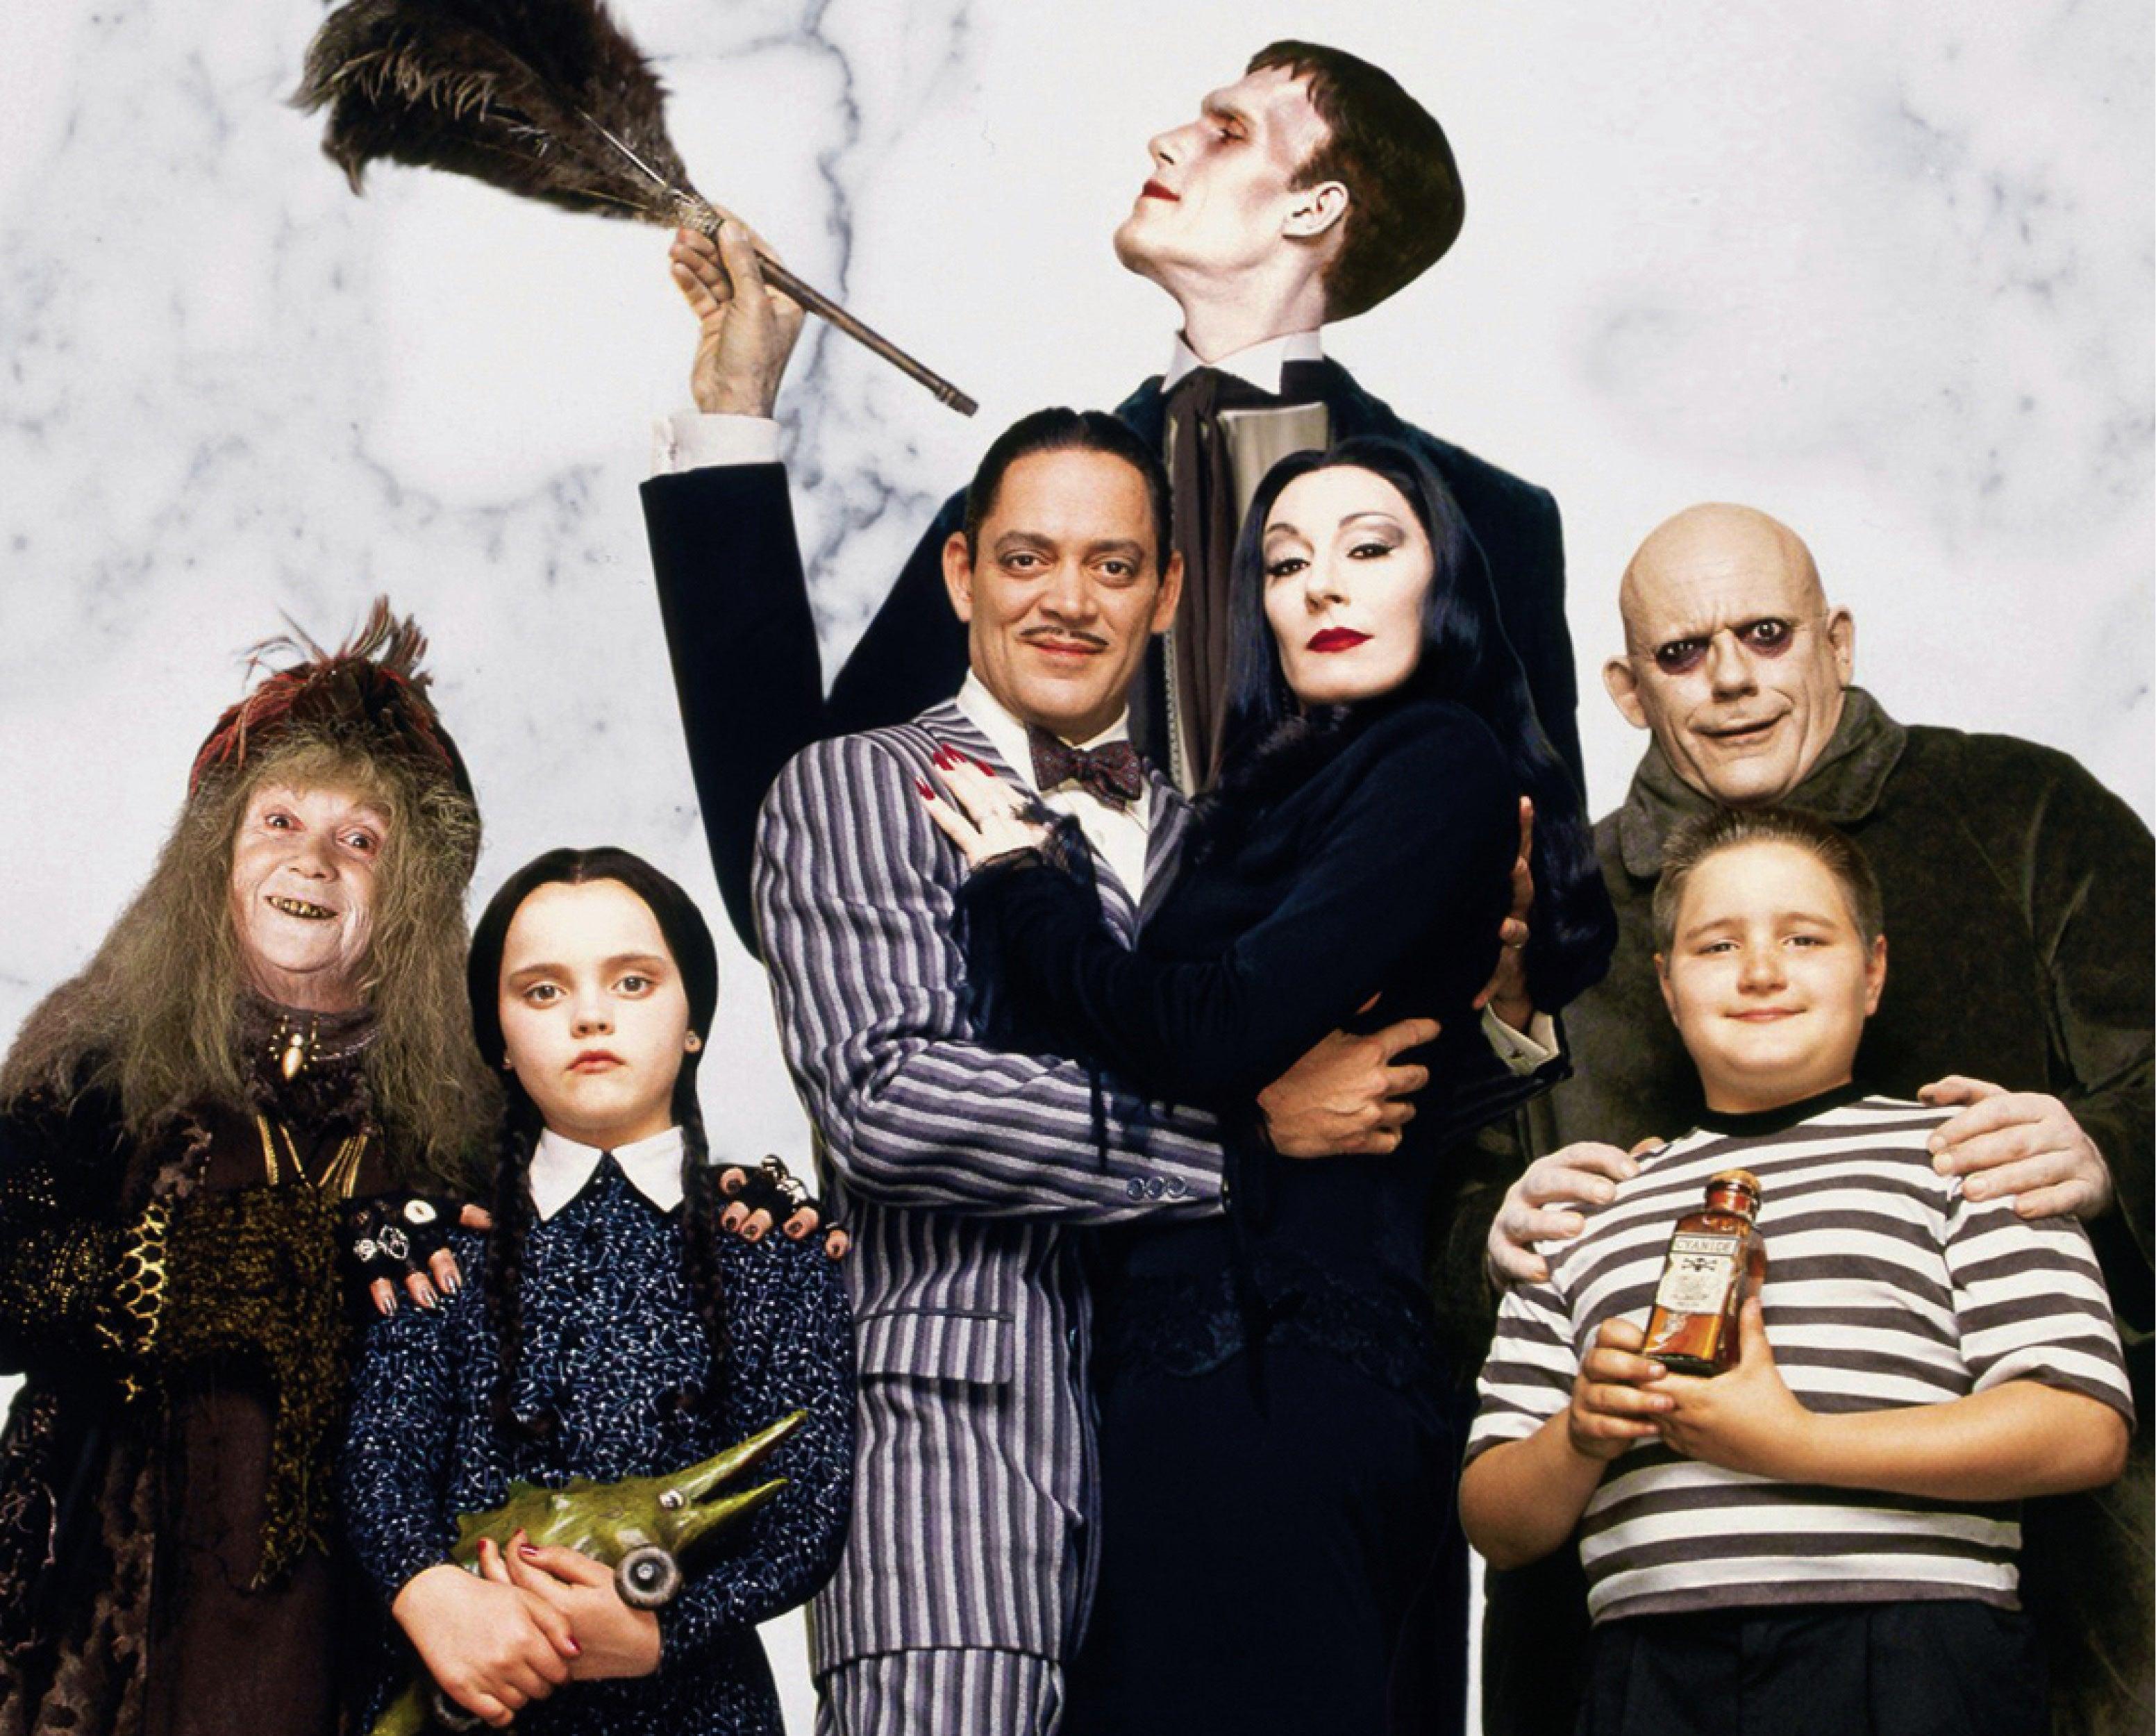 POPS1 - Addams Family - 745x600.jpg